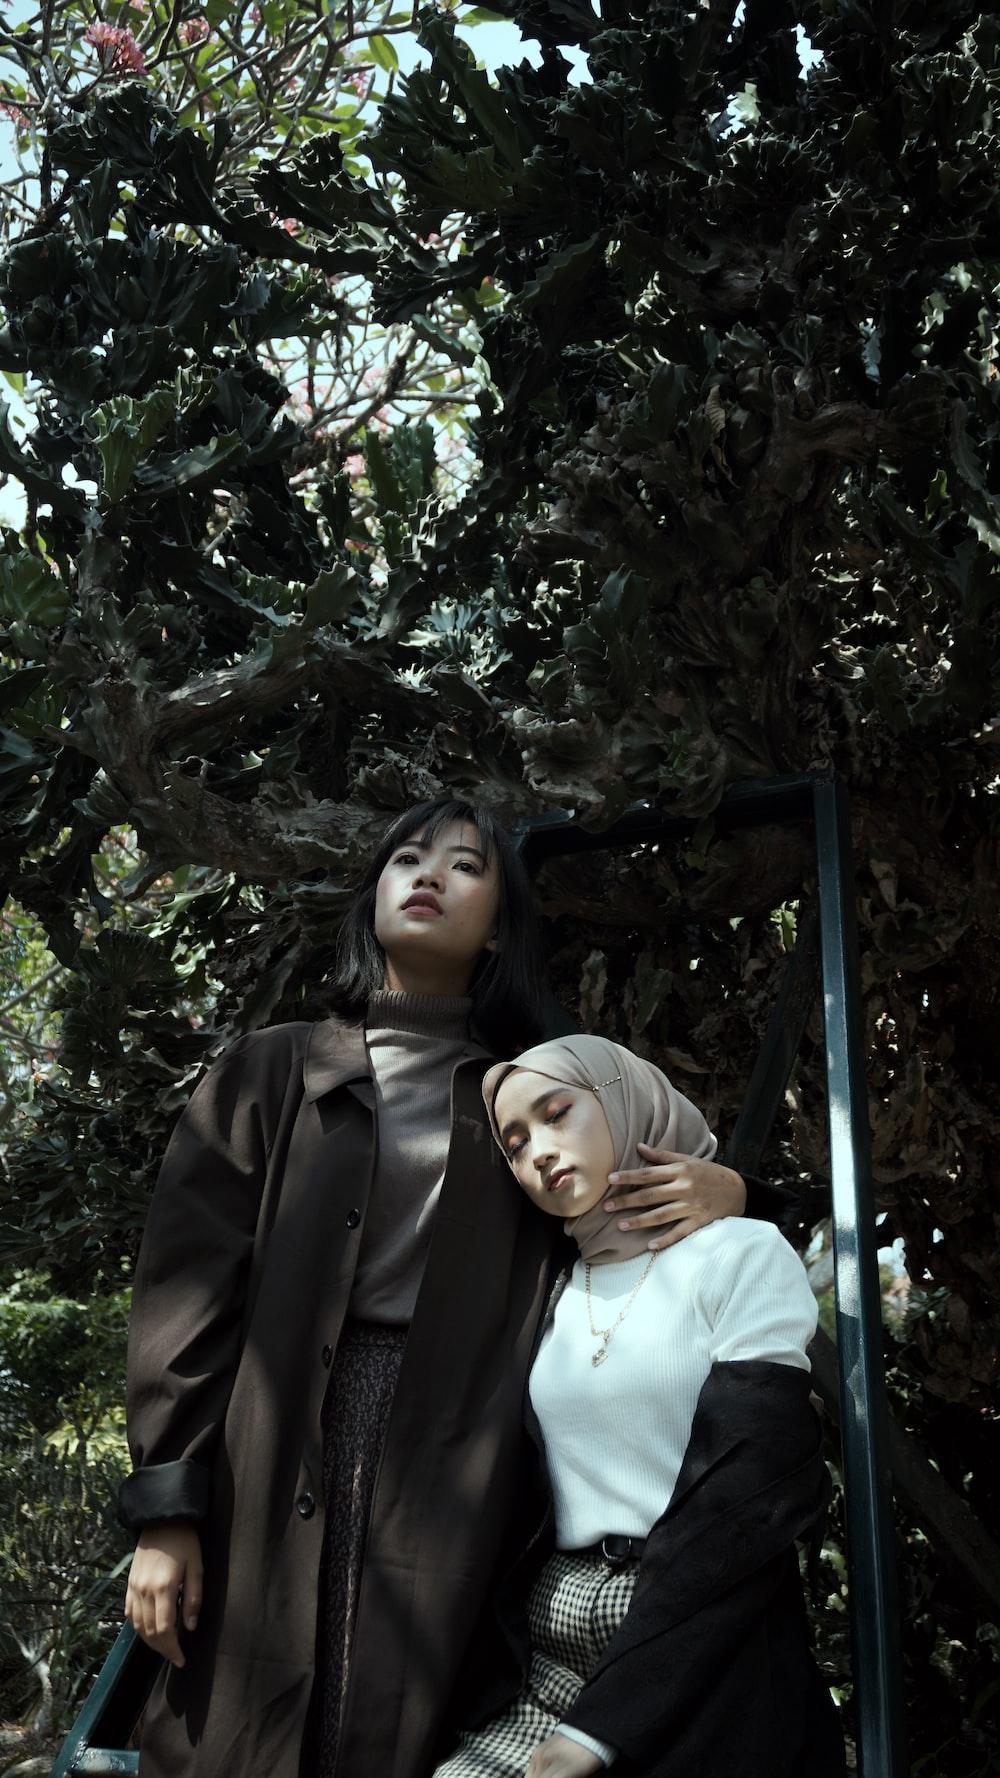 woman in black coat standing beside woman in white shirt